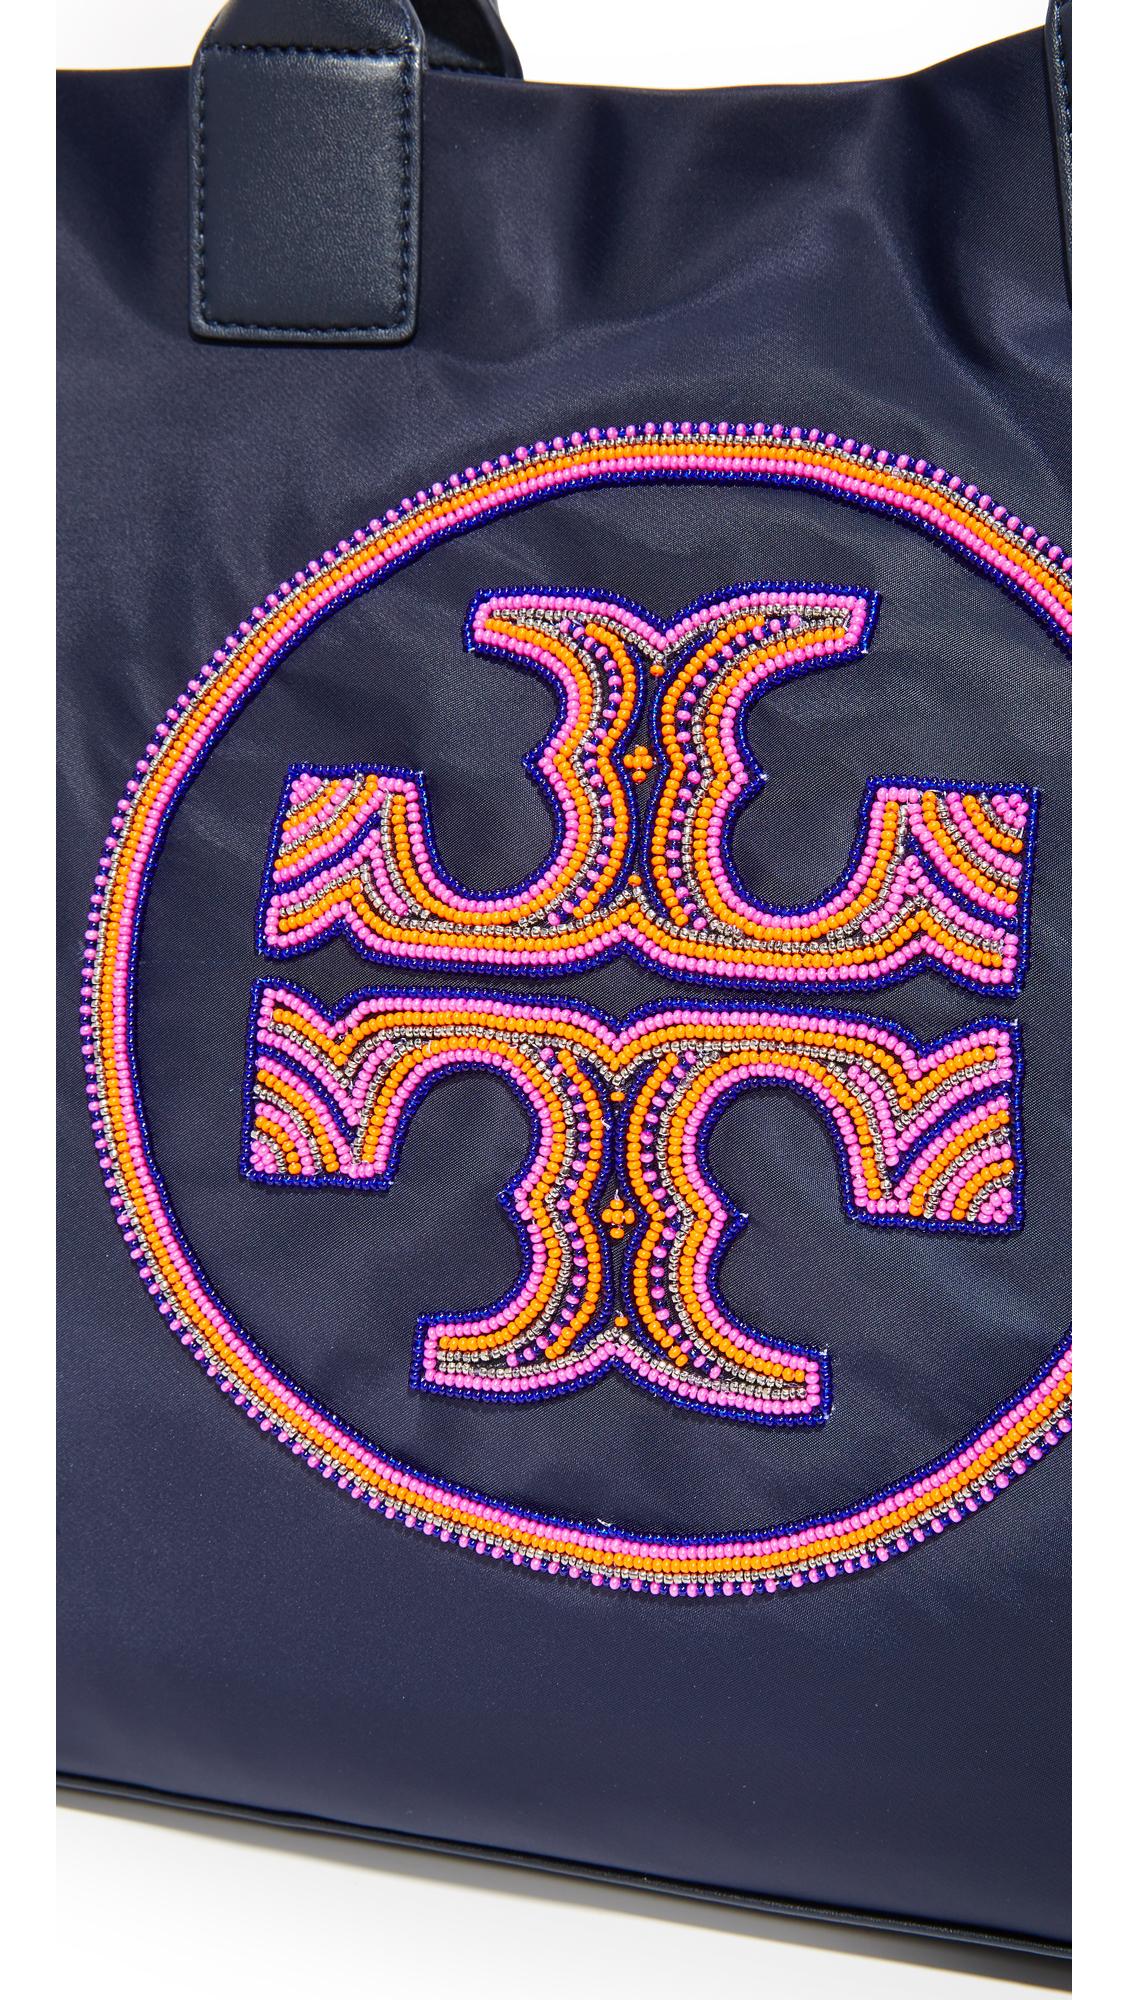 cdd1bfa0ee1 Tory Burch Ella Beaded Logo Tote